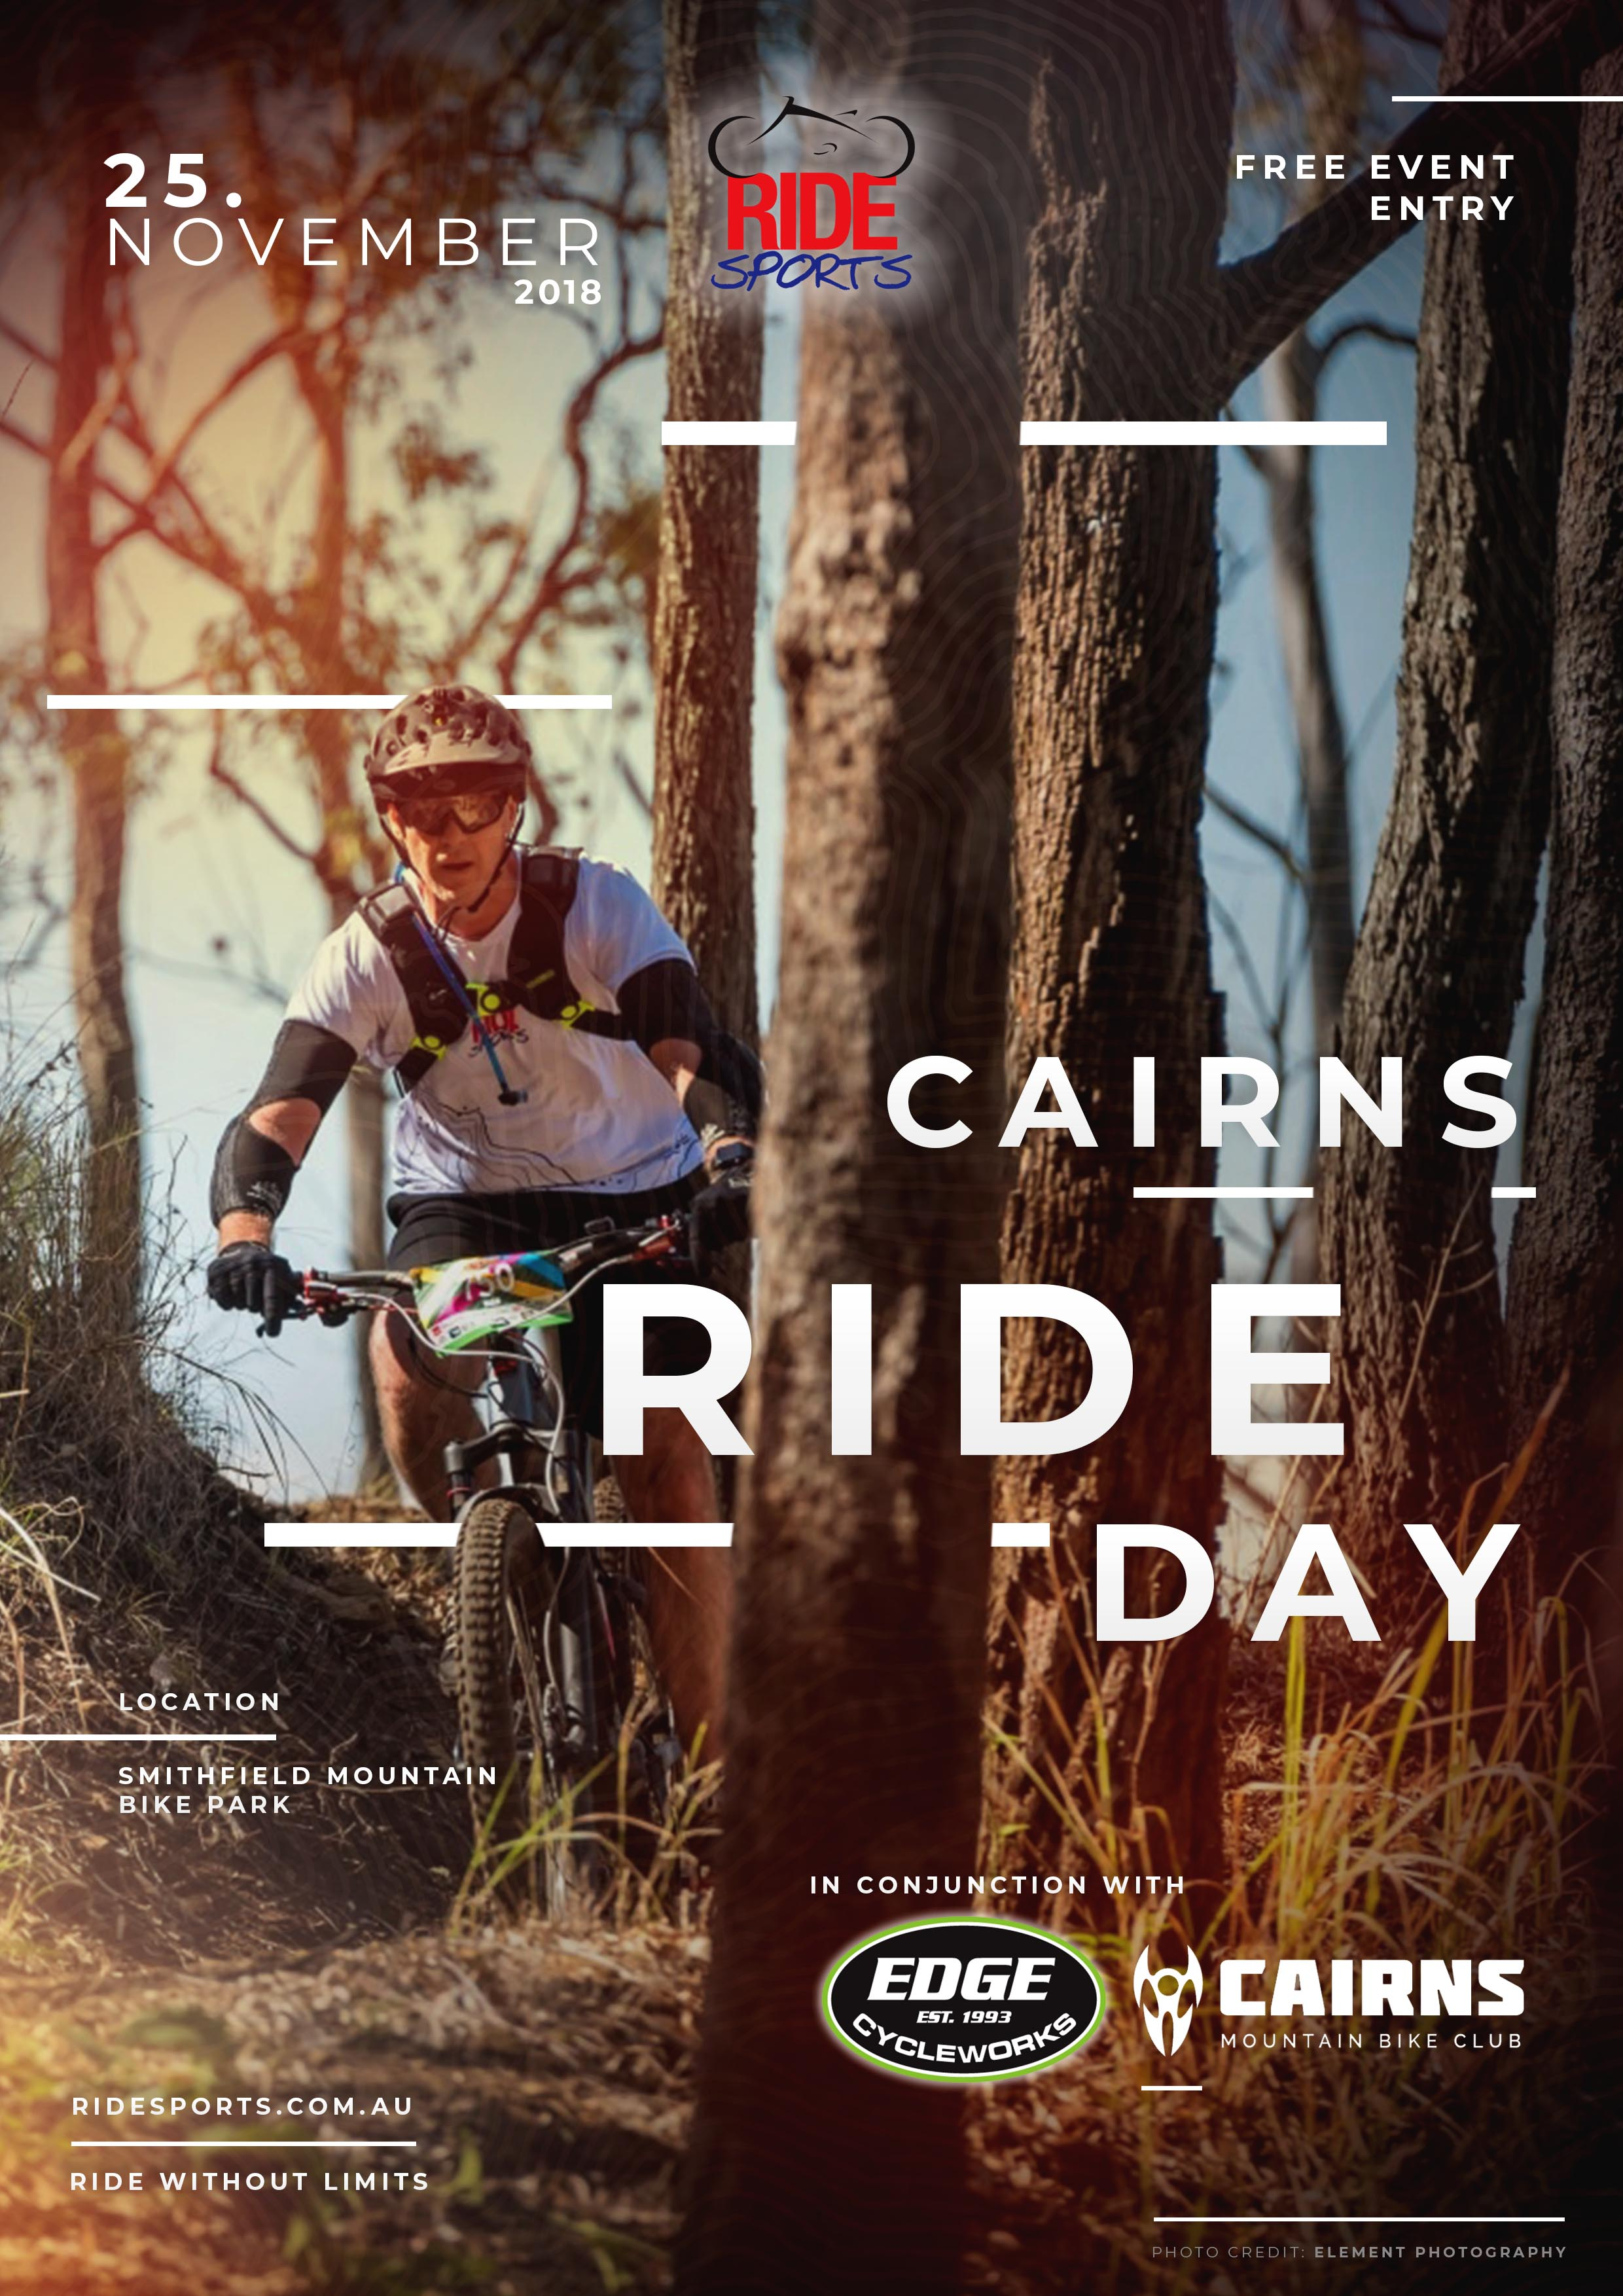 CAIRNS-poster-mockup copy.jpg